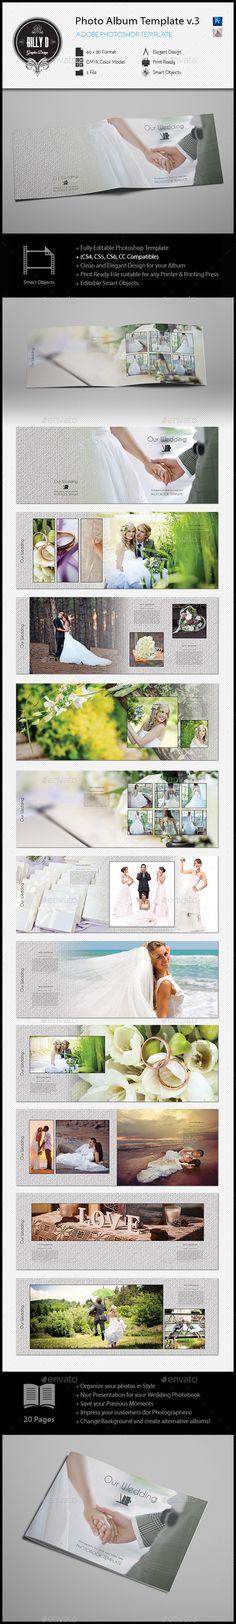 #Photo #Album Template v3 - Photo Albums Print #Templates Download here: https://graphicriver.net/item/photo-album-template-v3/10299744?ref=alena994